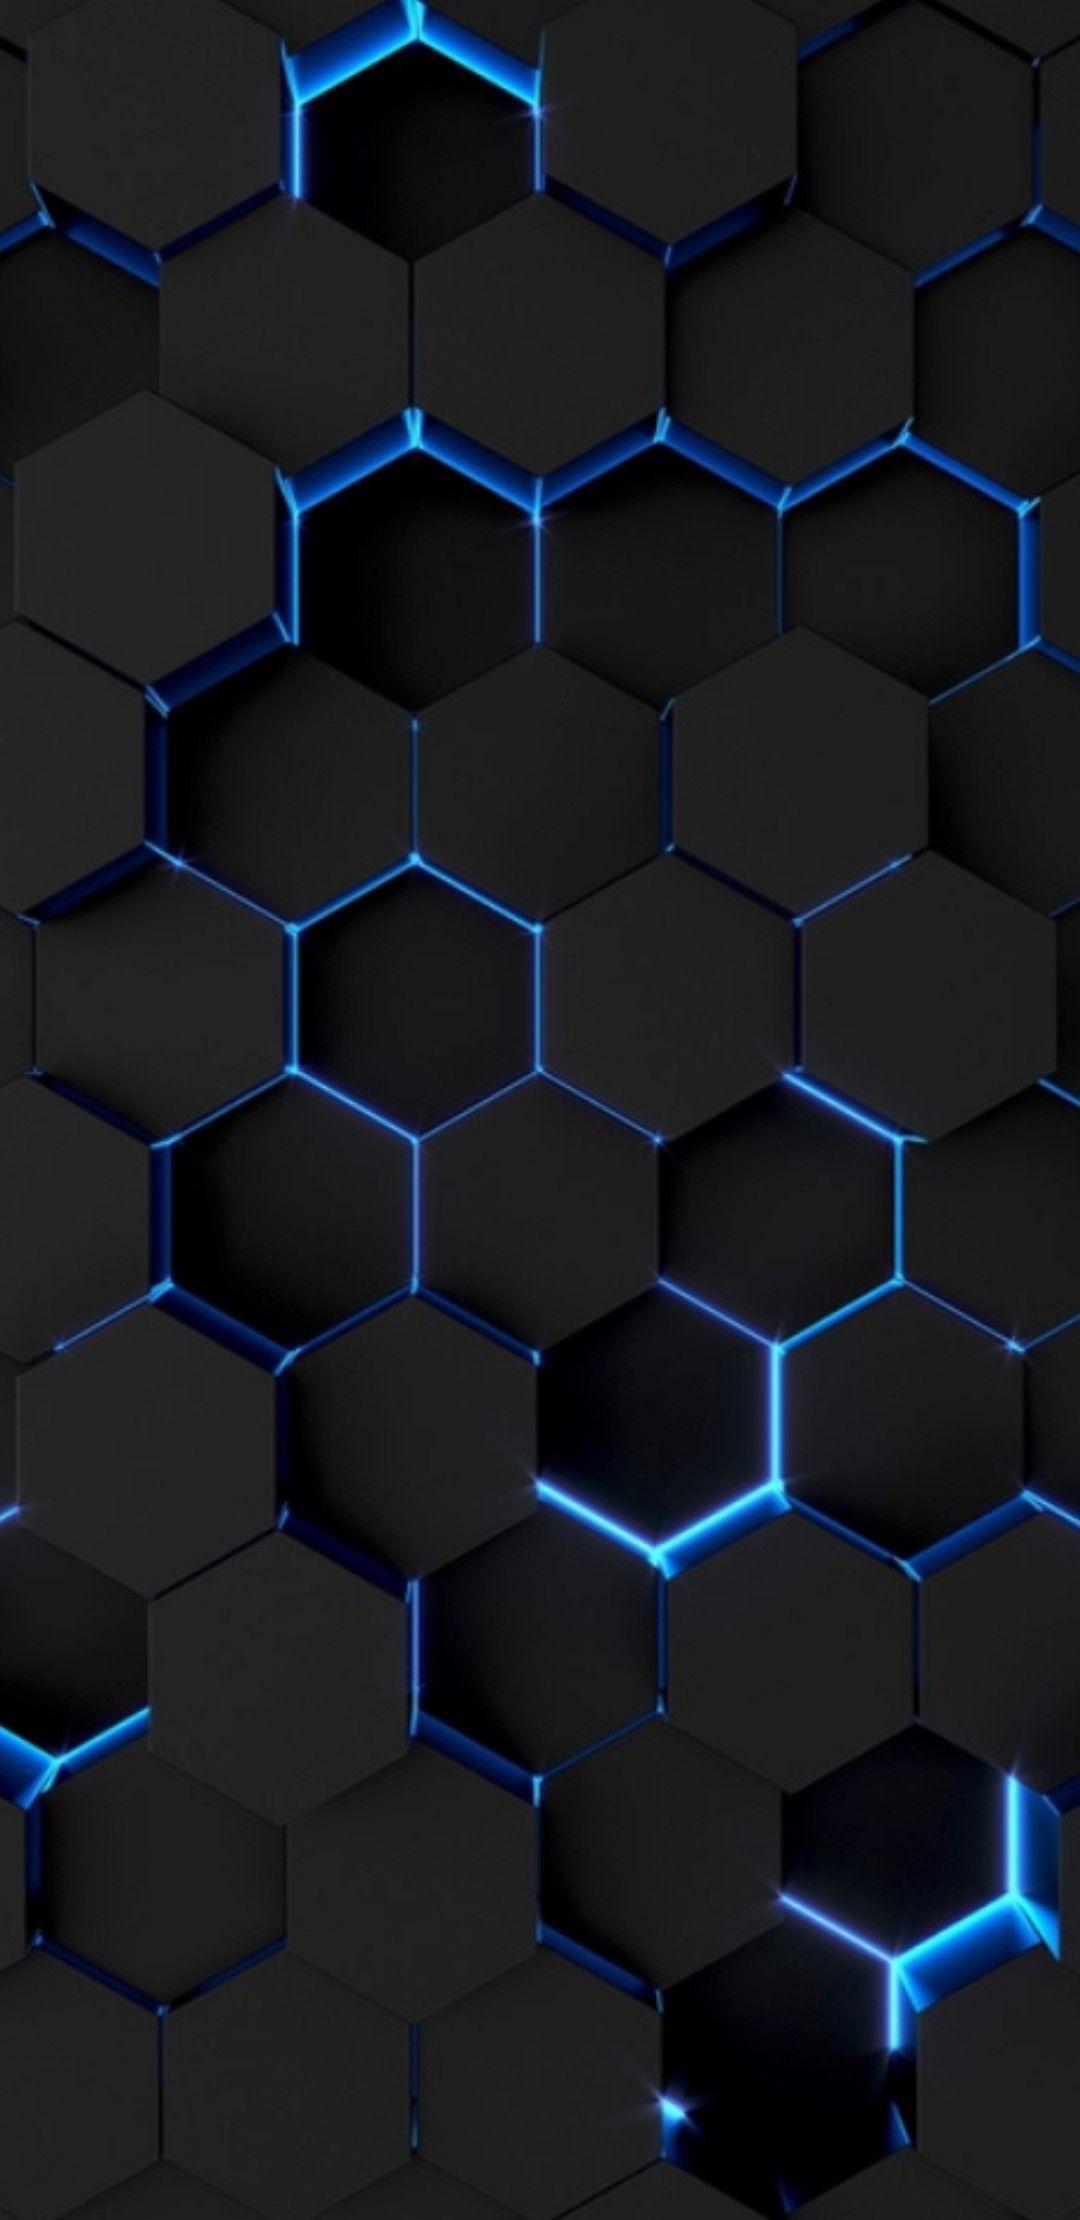 Black Surface Color Honeycomb Formation With A Slim Light Blue Neon L E D Outline Phone Wallpaper Design Technology Wallpaper Phone Wallpaper